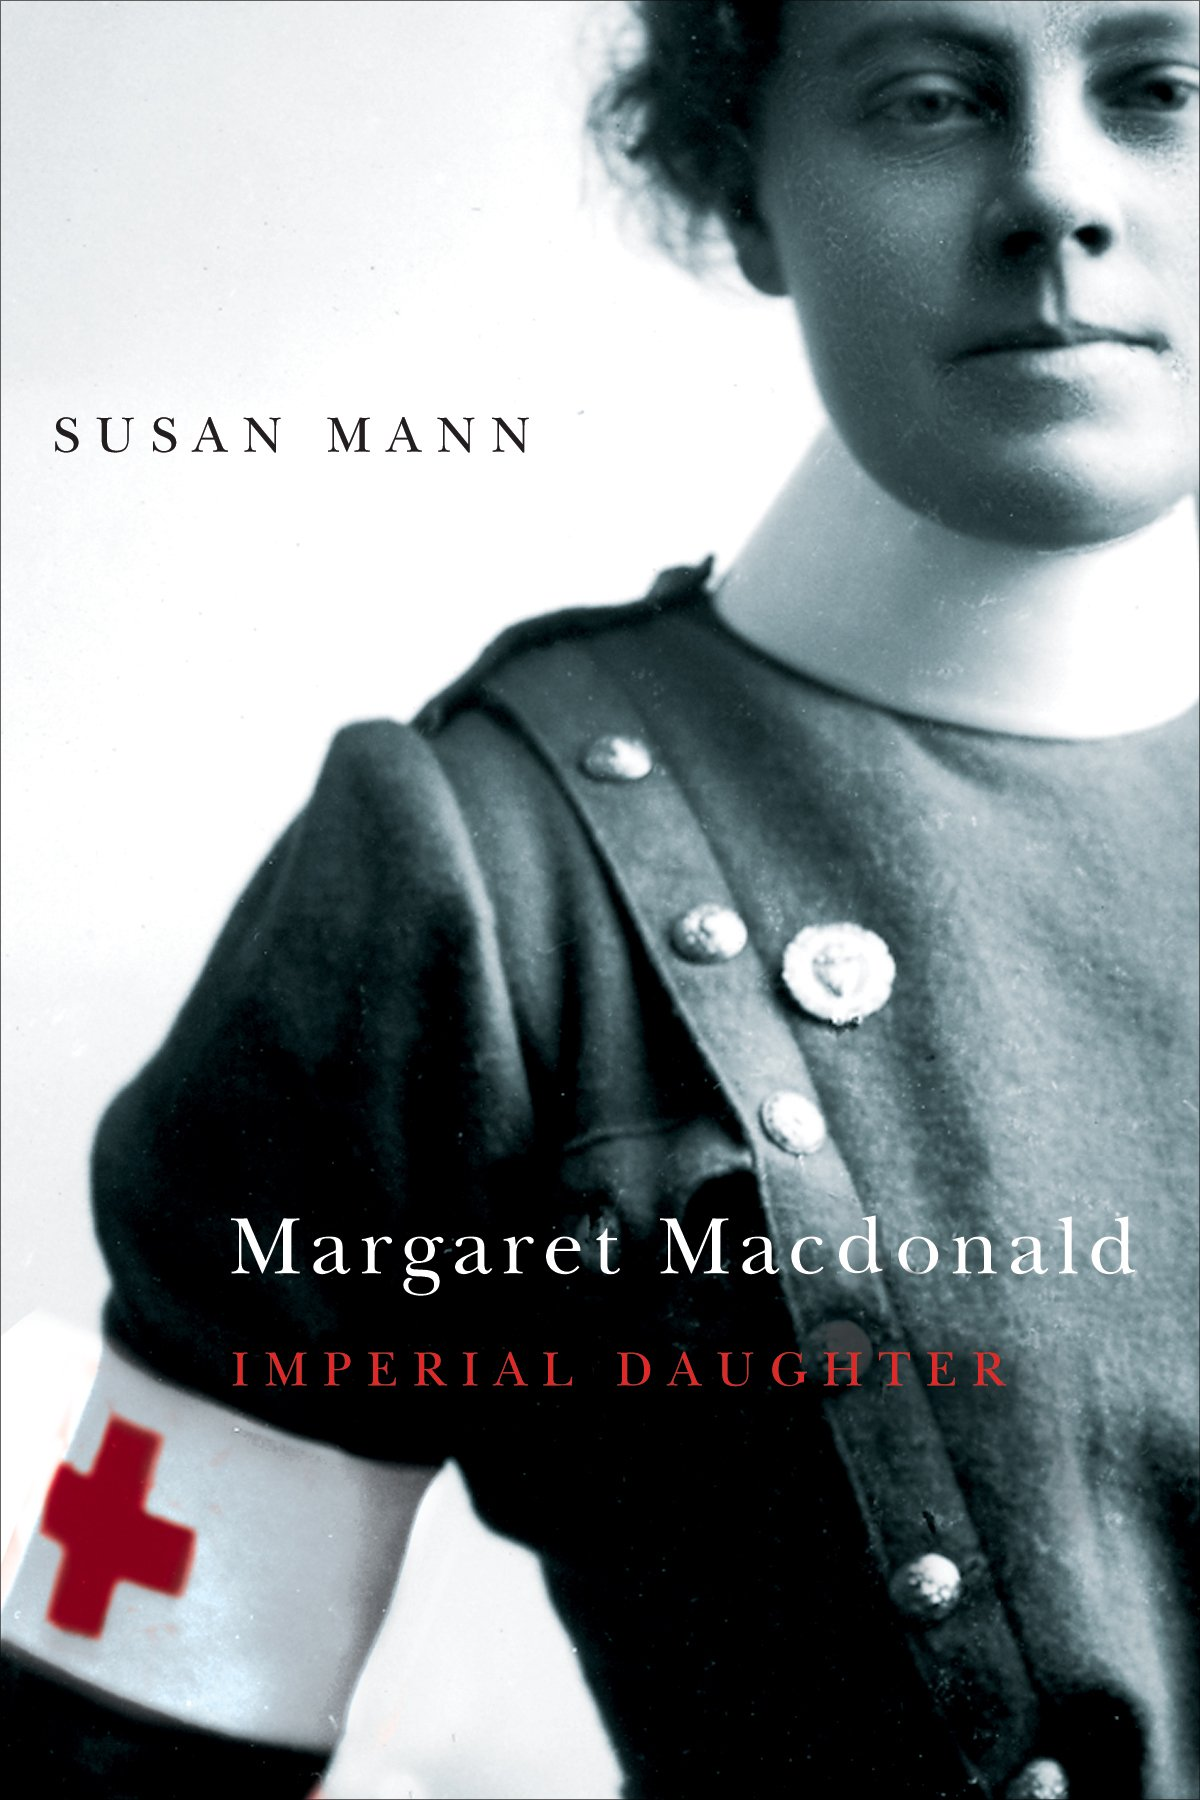 Download Margaret Macdonald: Imperial Daughter (Footprints Series) ebook